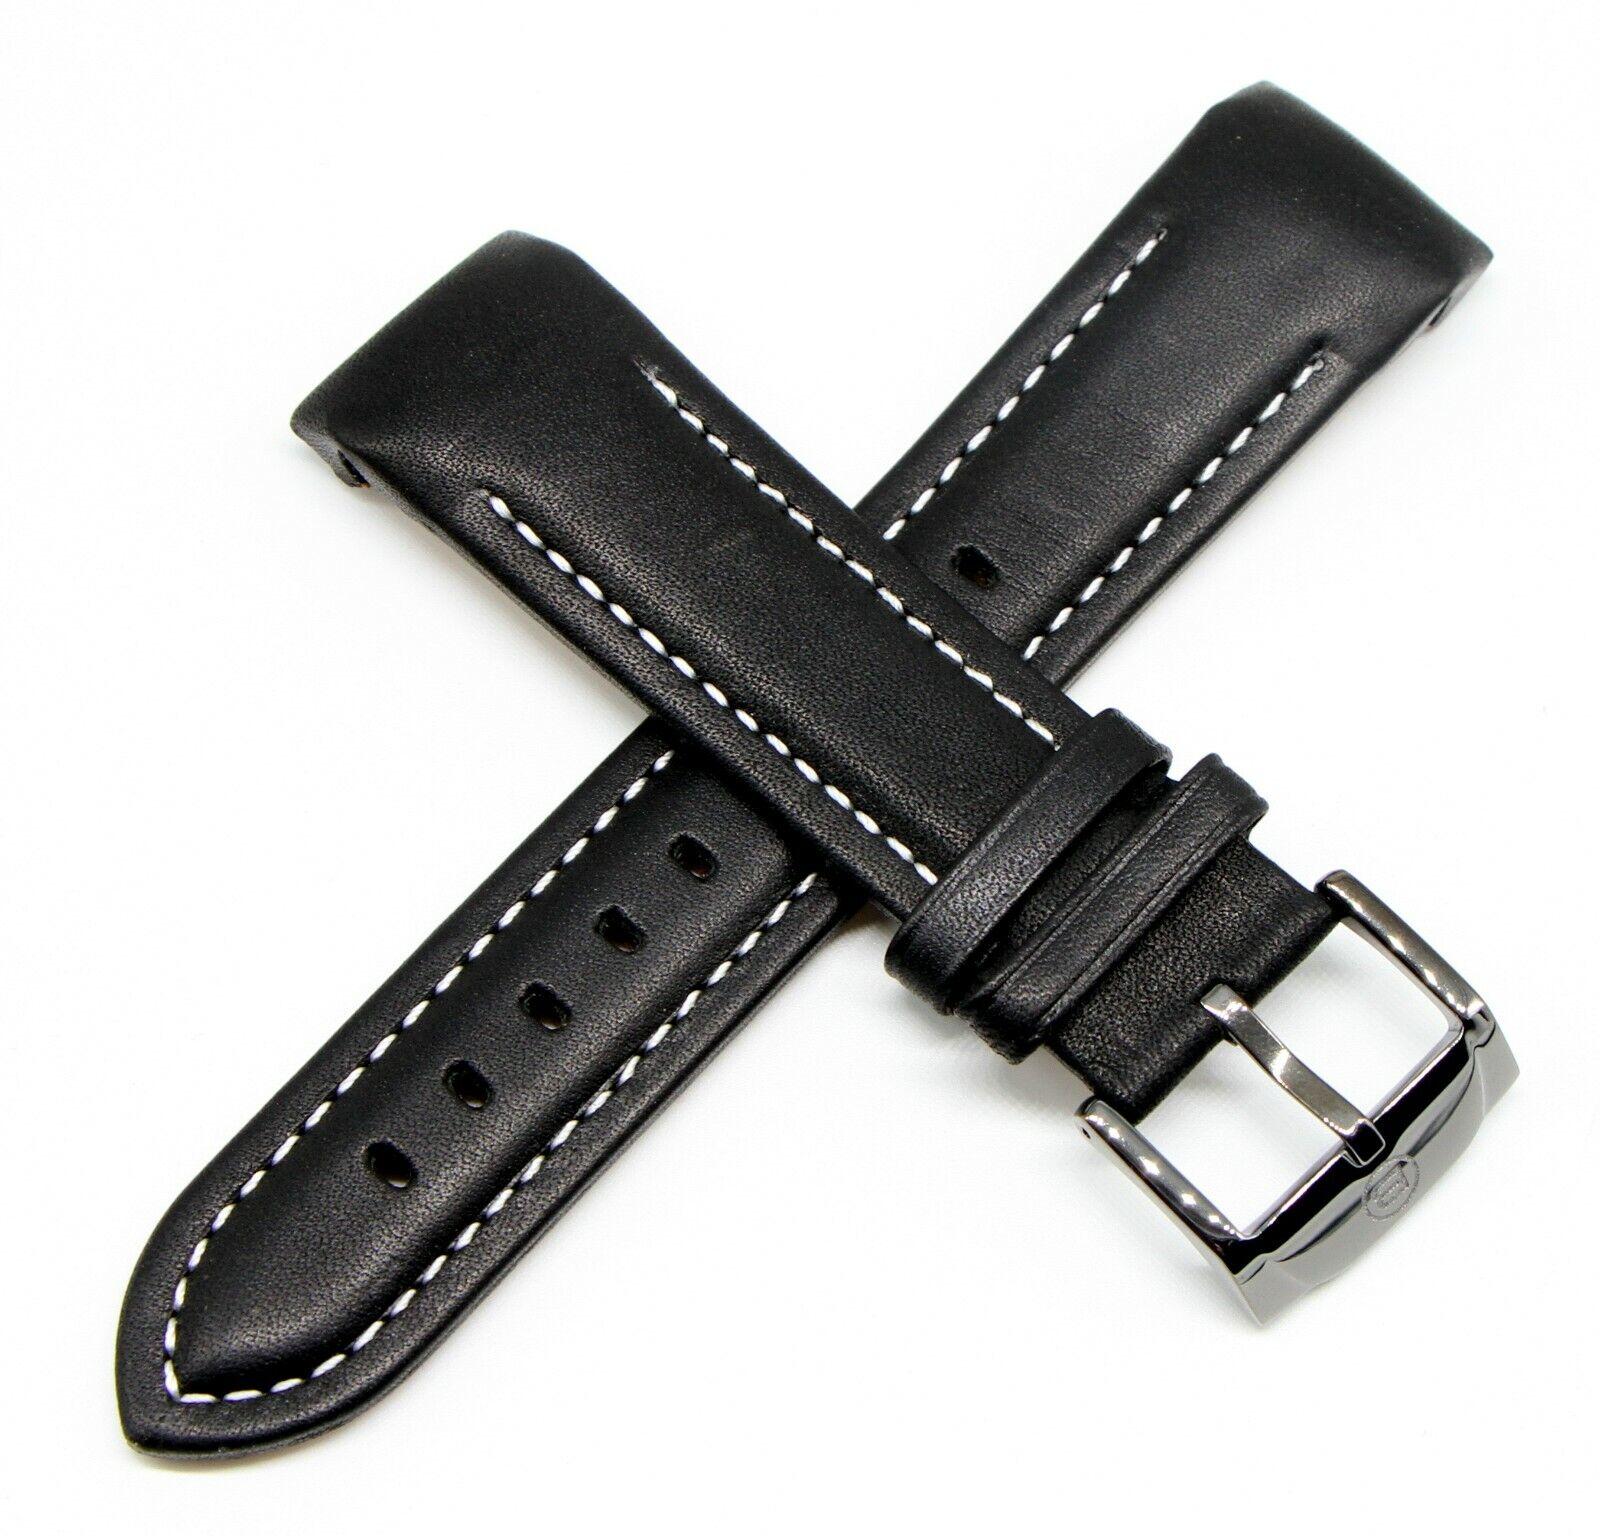 Ben & Sons Uhrenarmband 24MM Schwarz aus echtem Leder für Modell Mercury